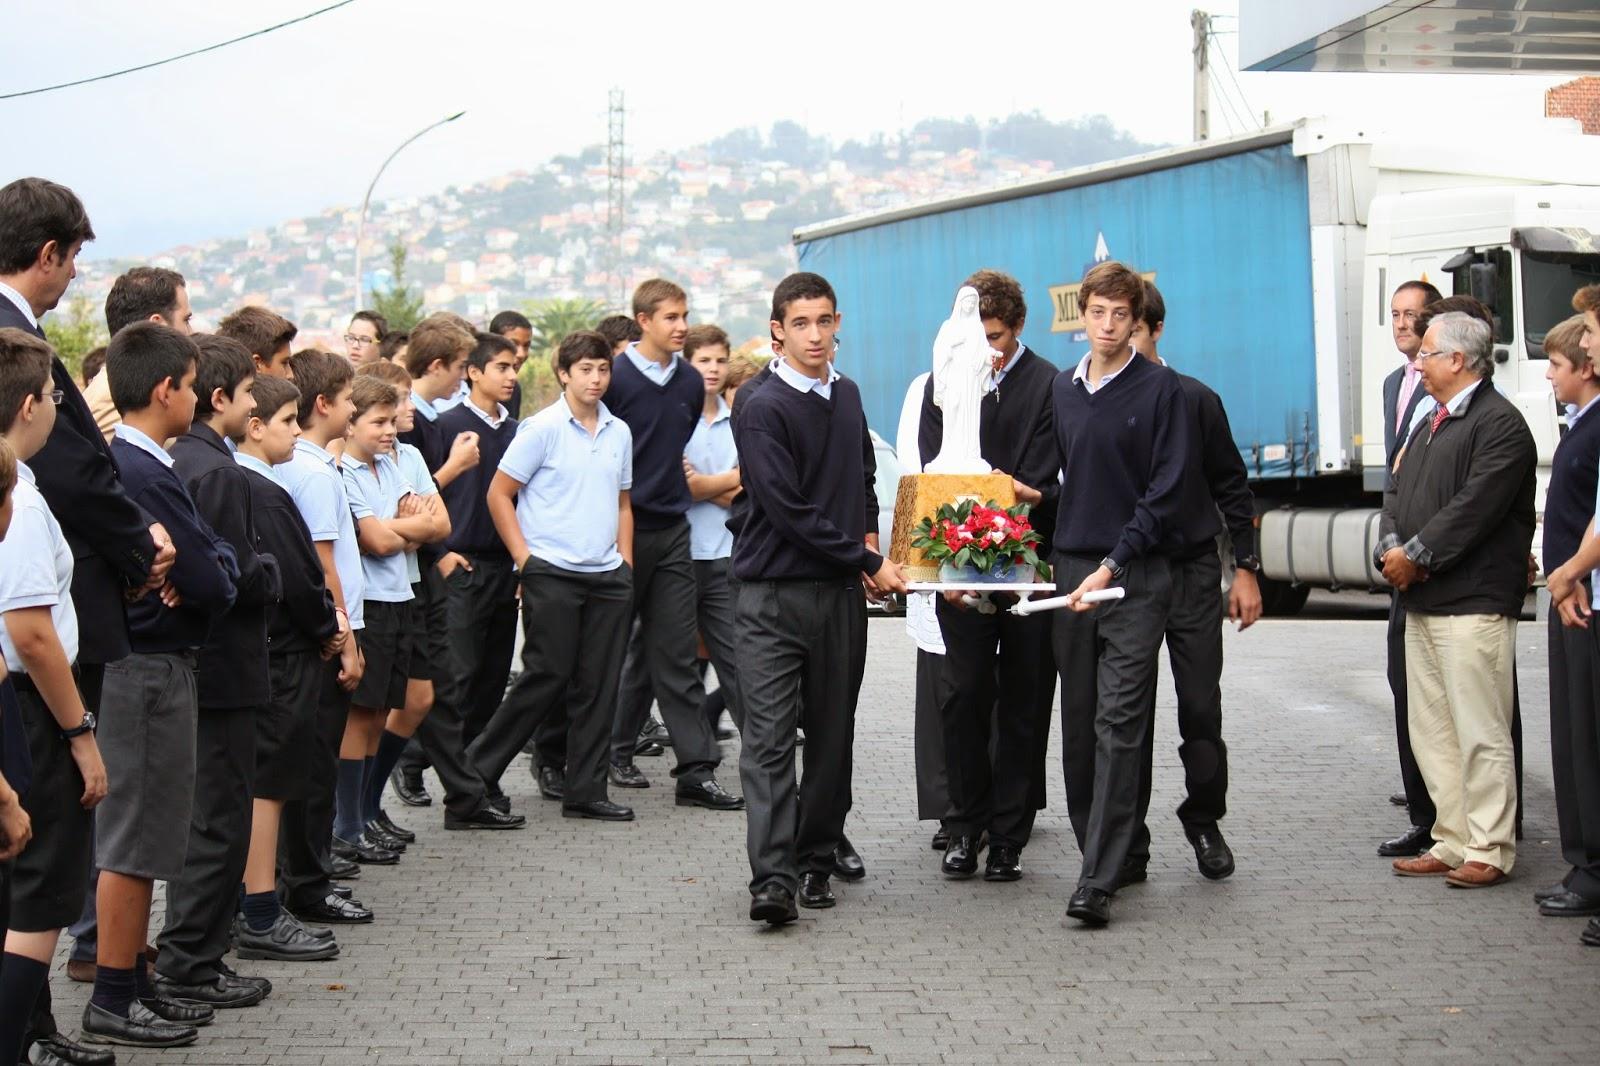 Gospa peregrina reina de la paz visita colegio - Colegio monterrey vigo ...